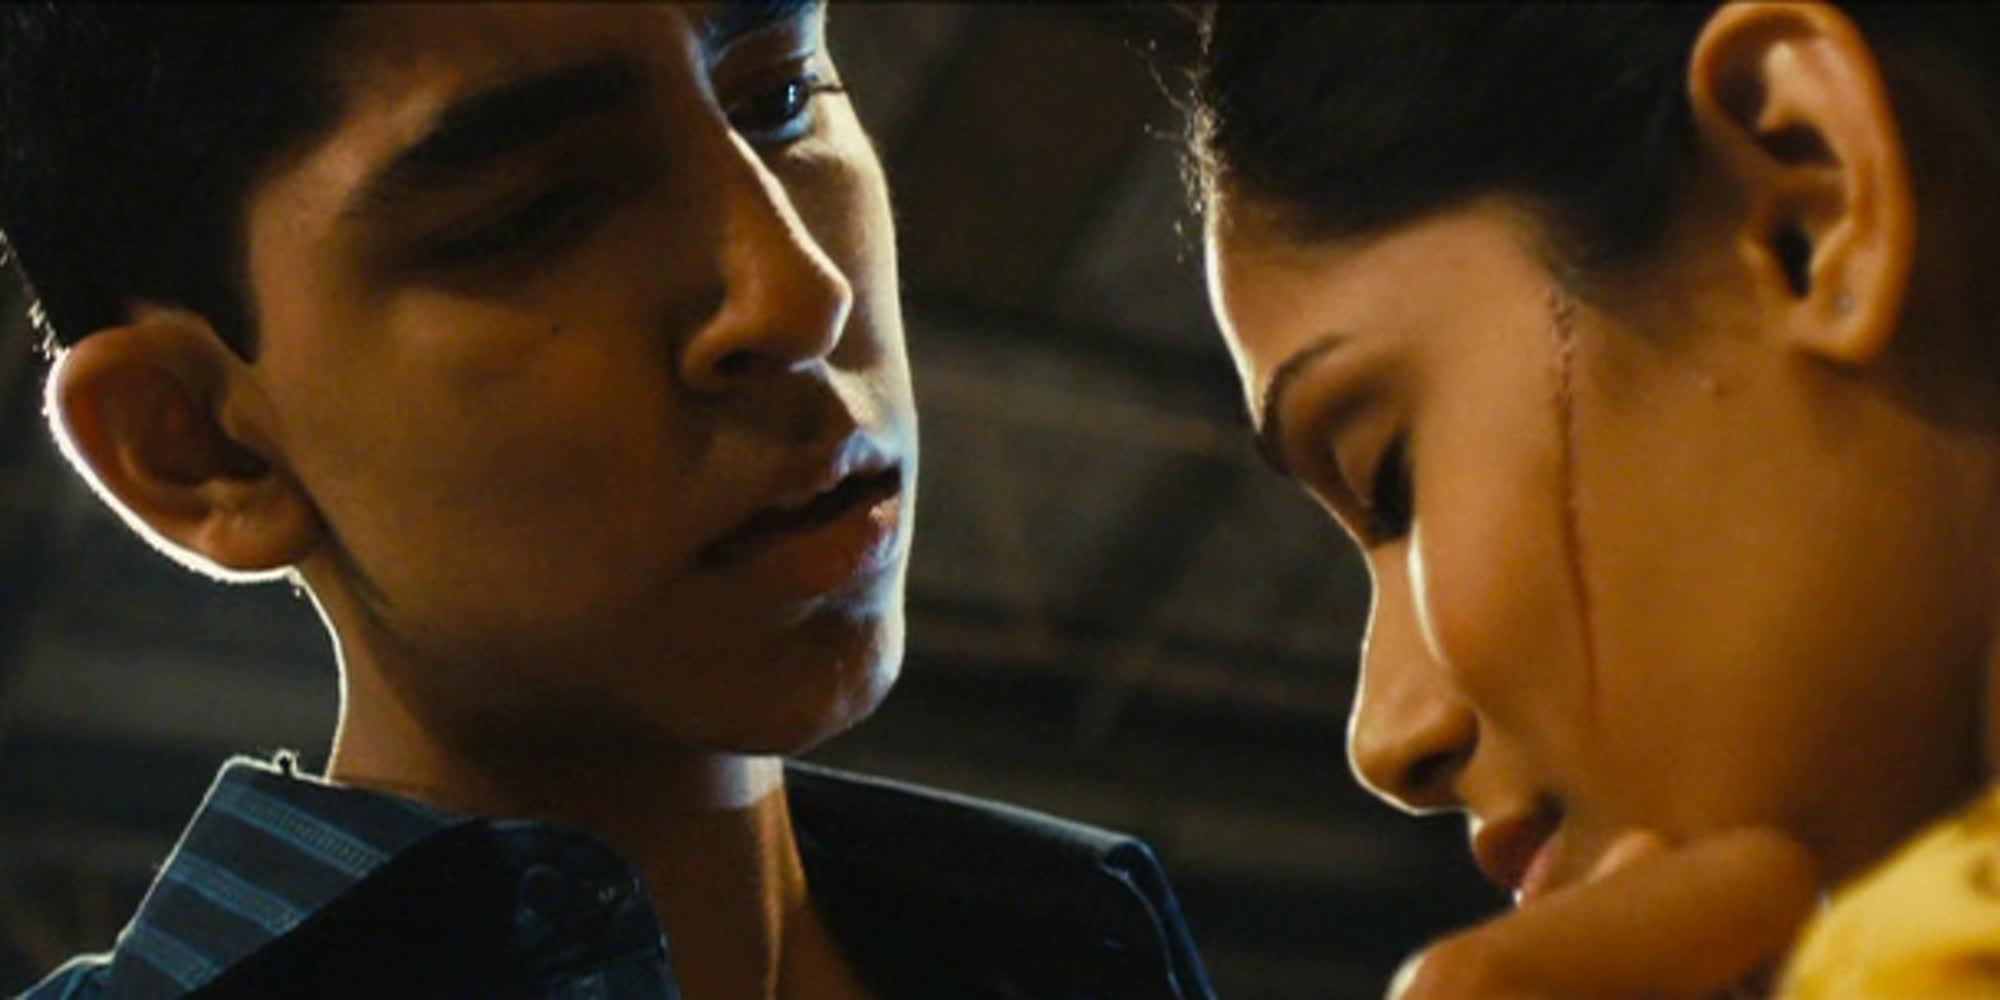 Utsnitt fra filmen Slumdog Millionaire.